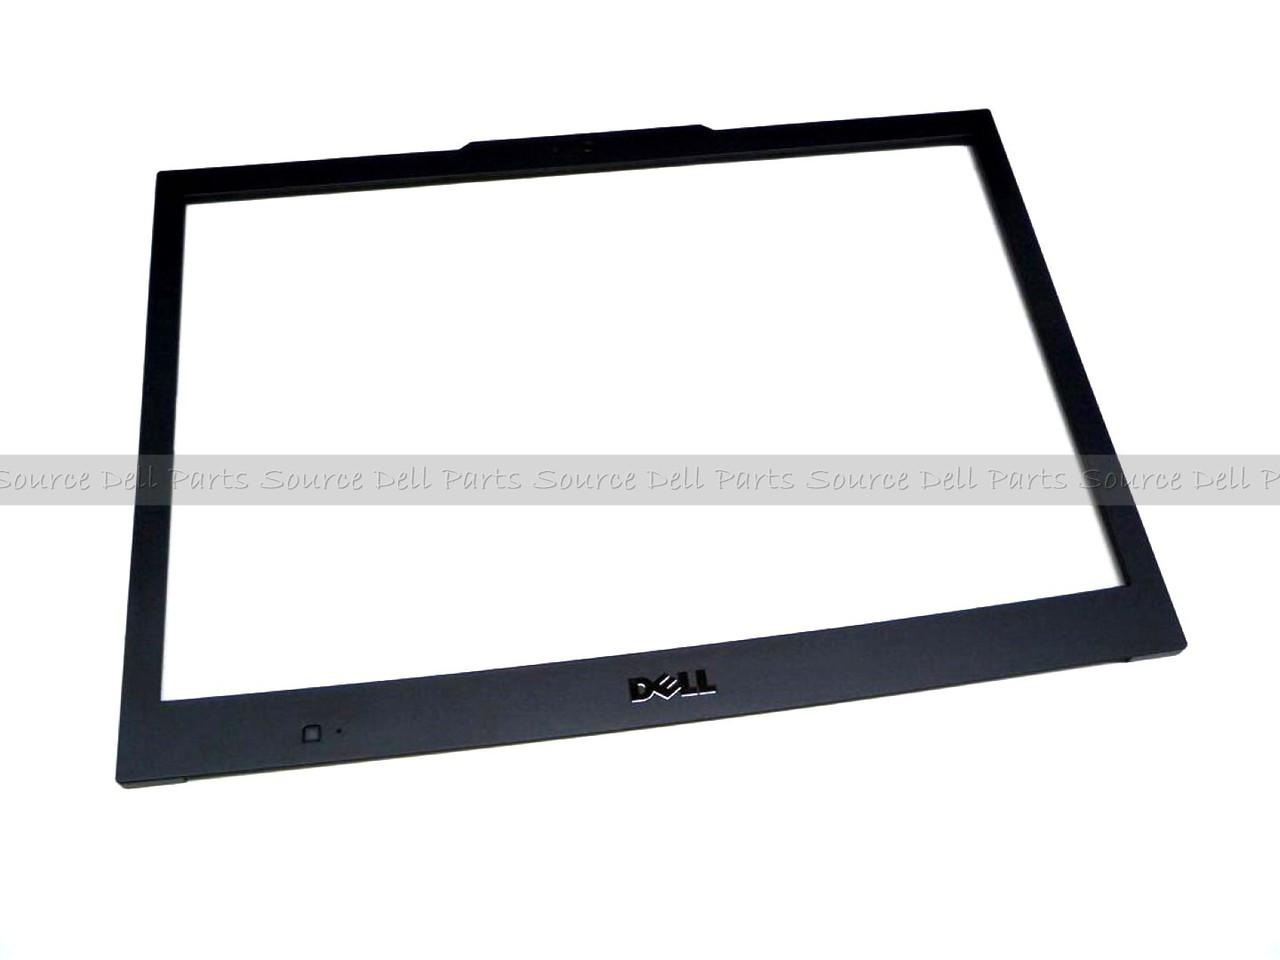 Dell Latitude E4300 LCD Front Trim Bezel With Camera Window - P38XR